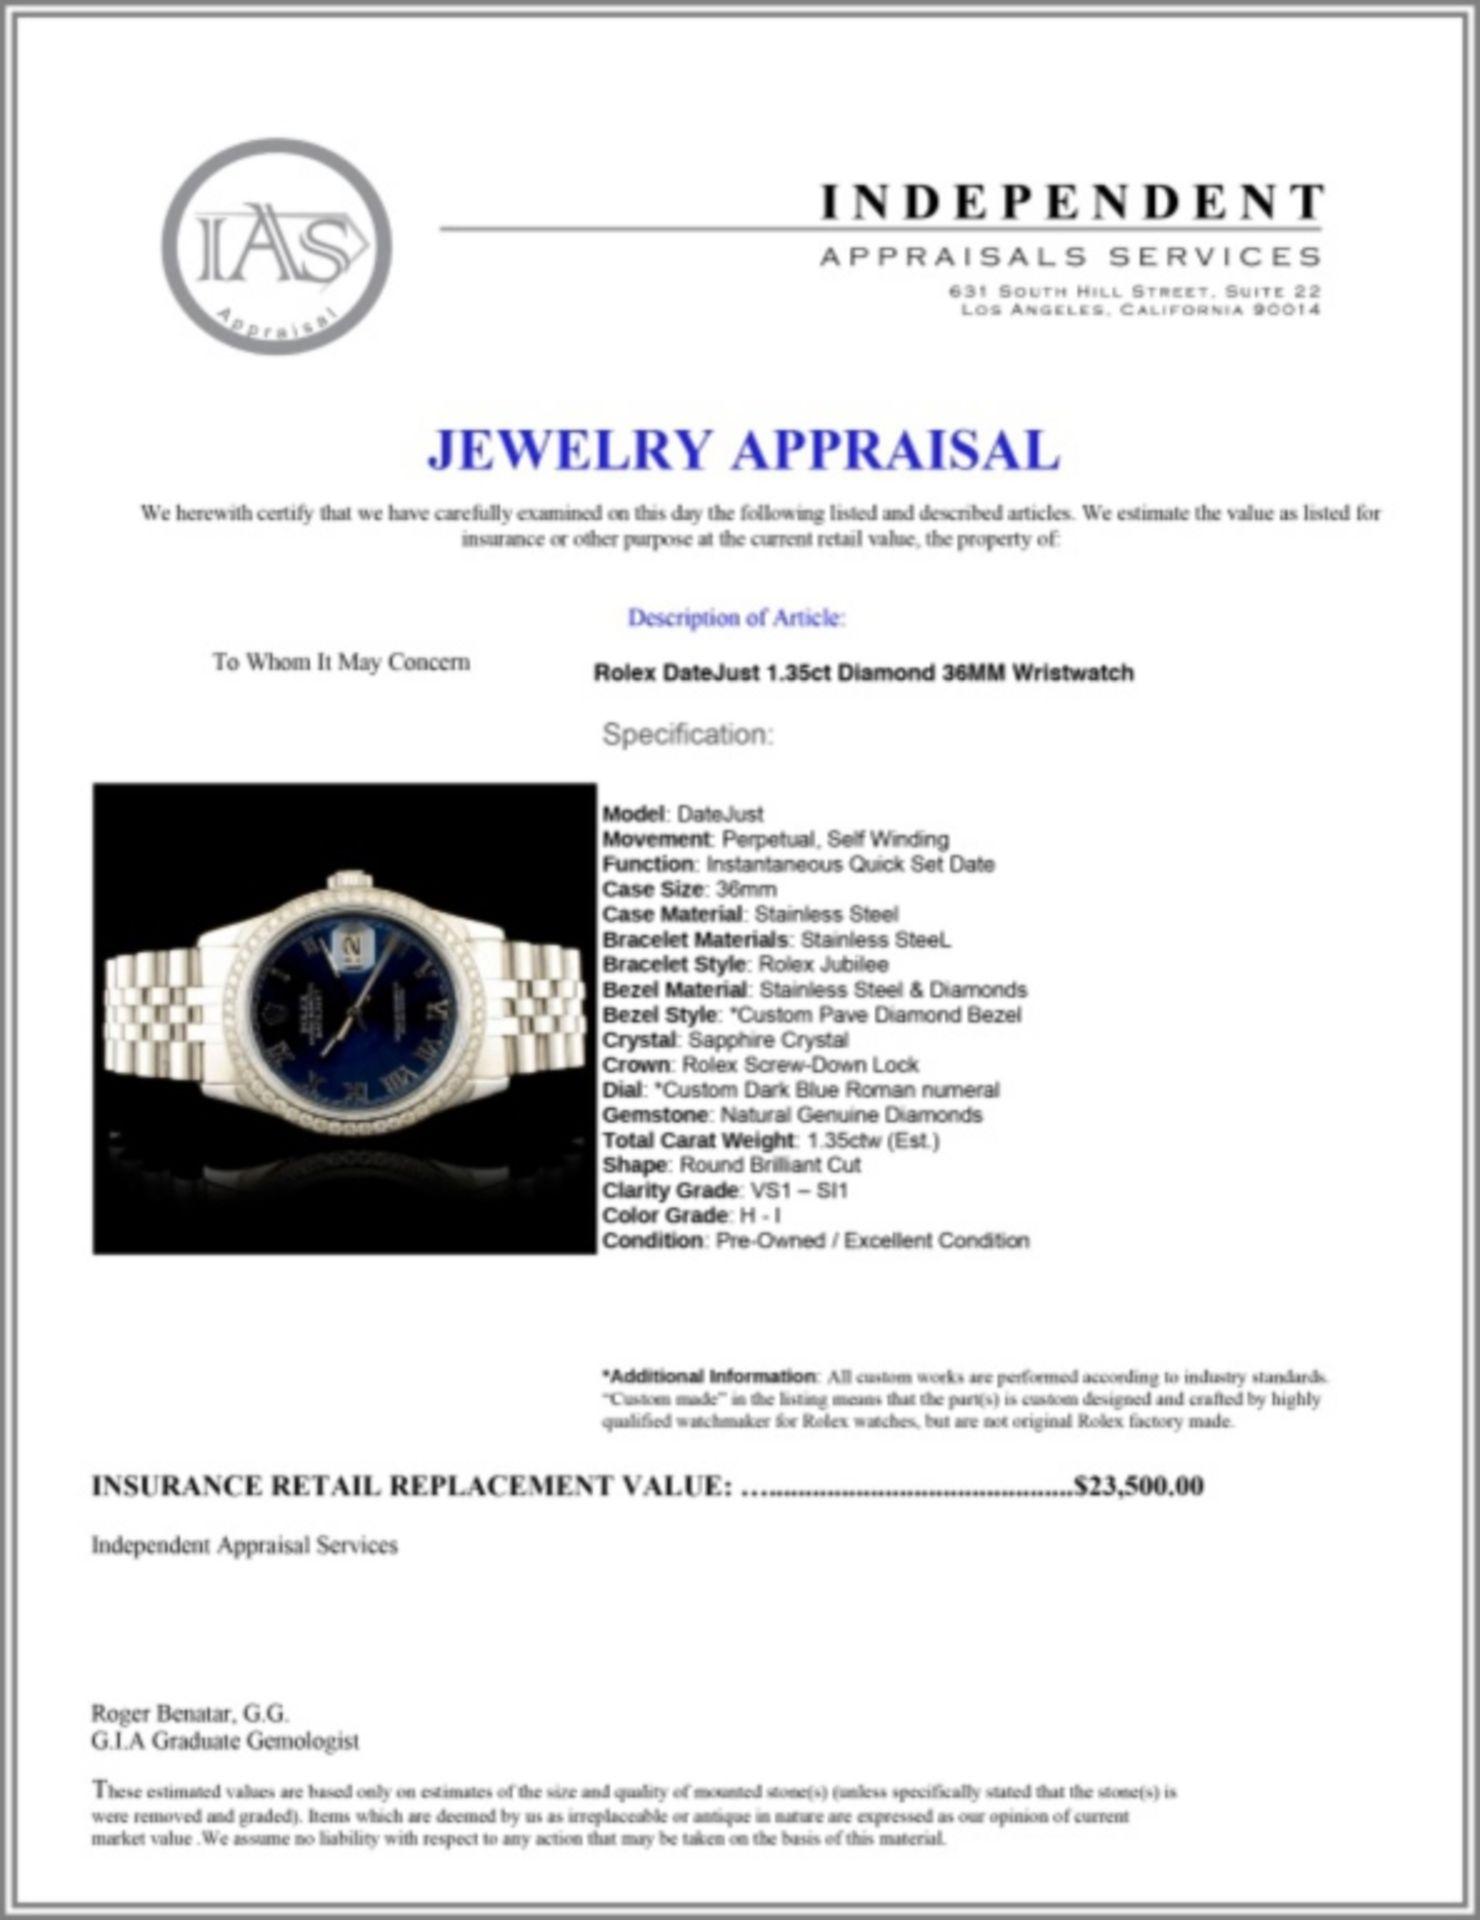 Rolex DateJust 1.35ct Diamond 36MM Wristwatch - Image 4 of 4